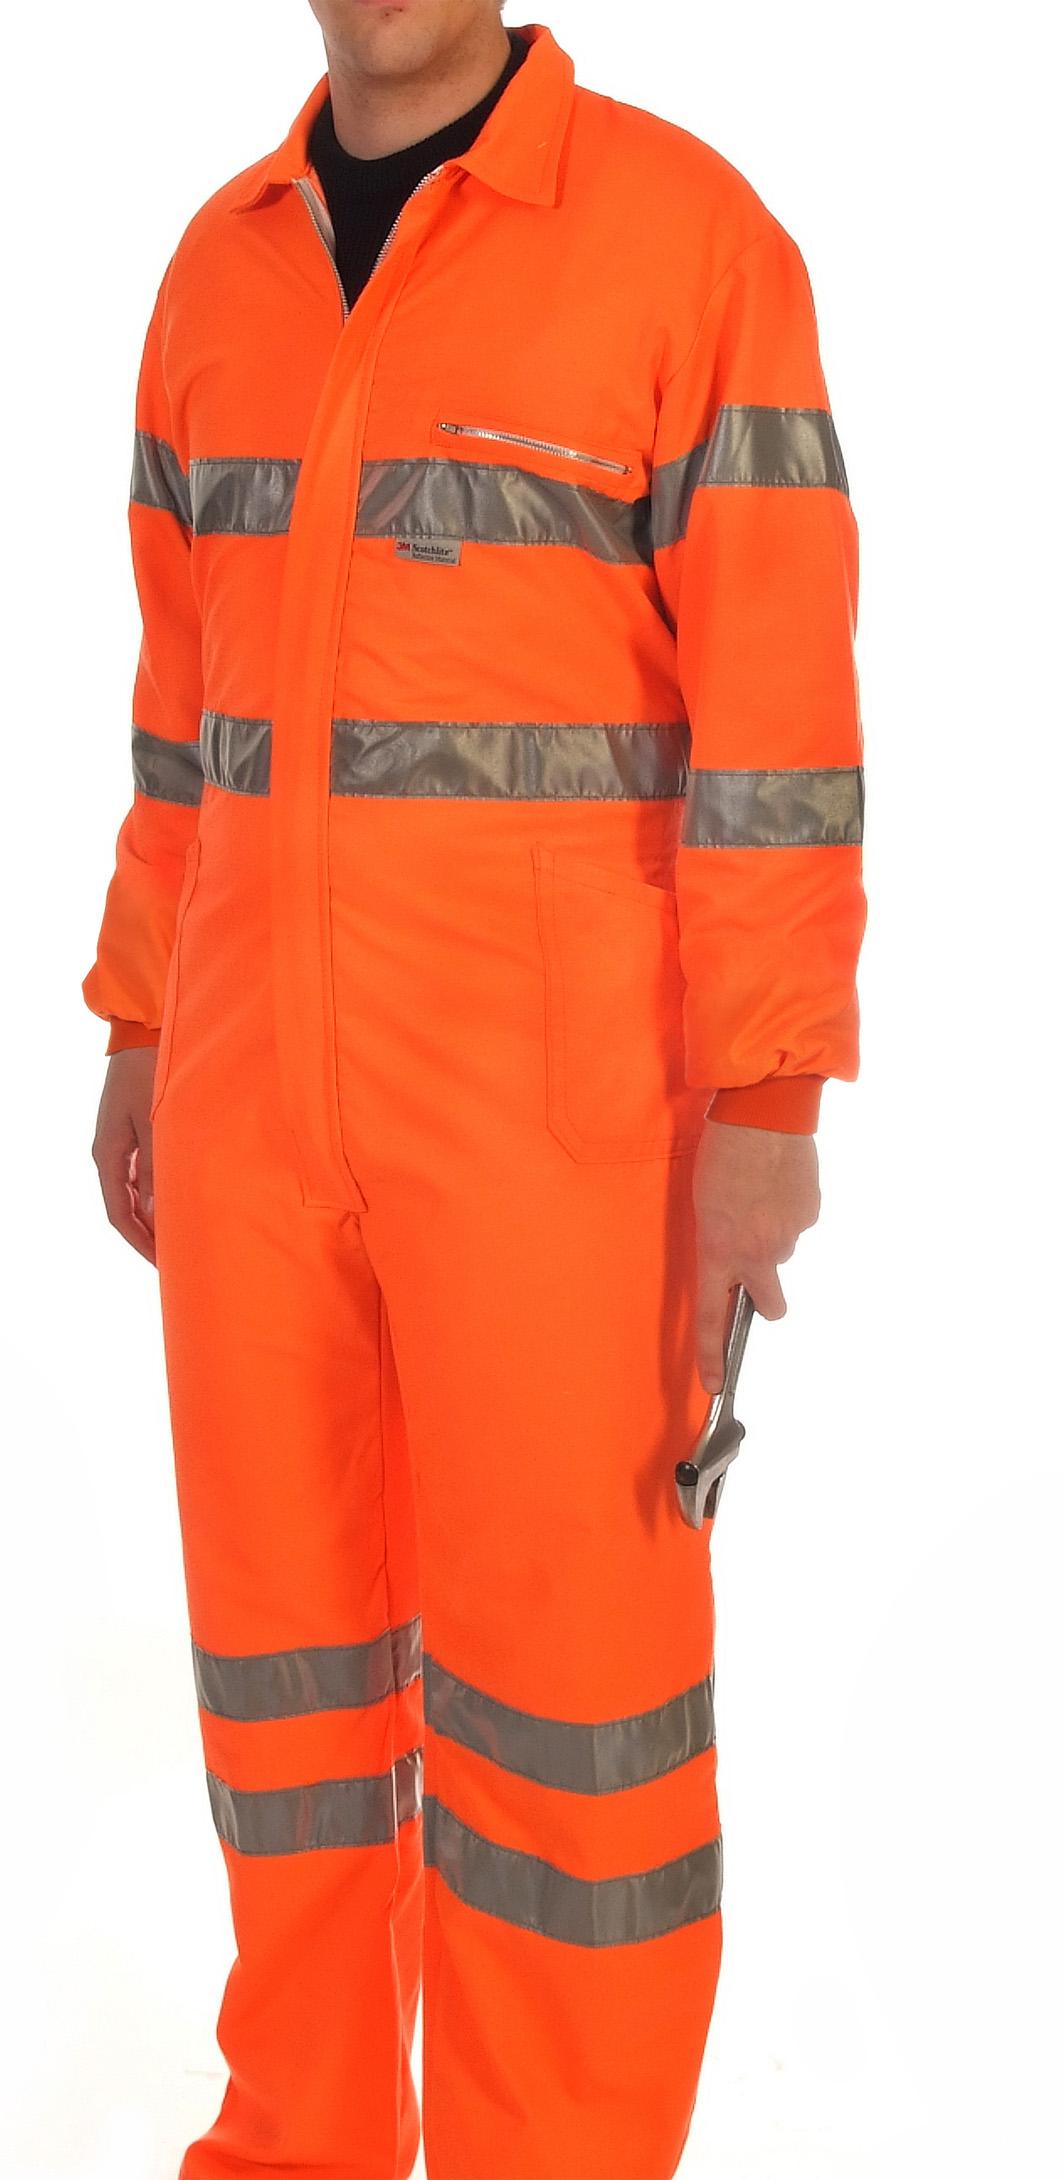 Orange hi-visibility coverall Image